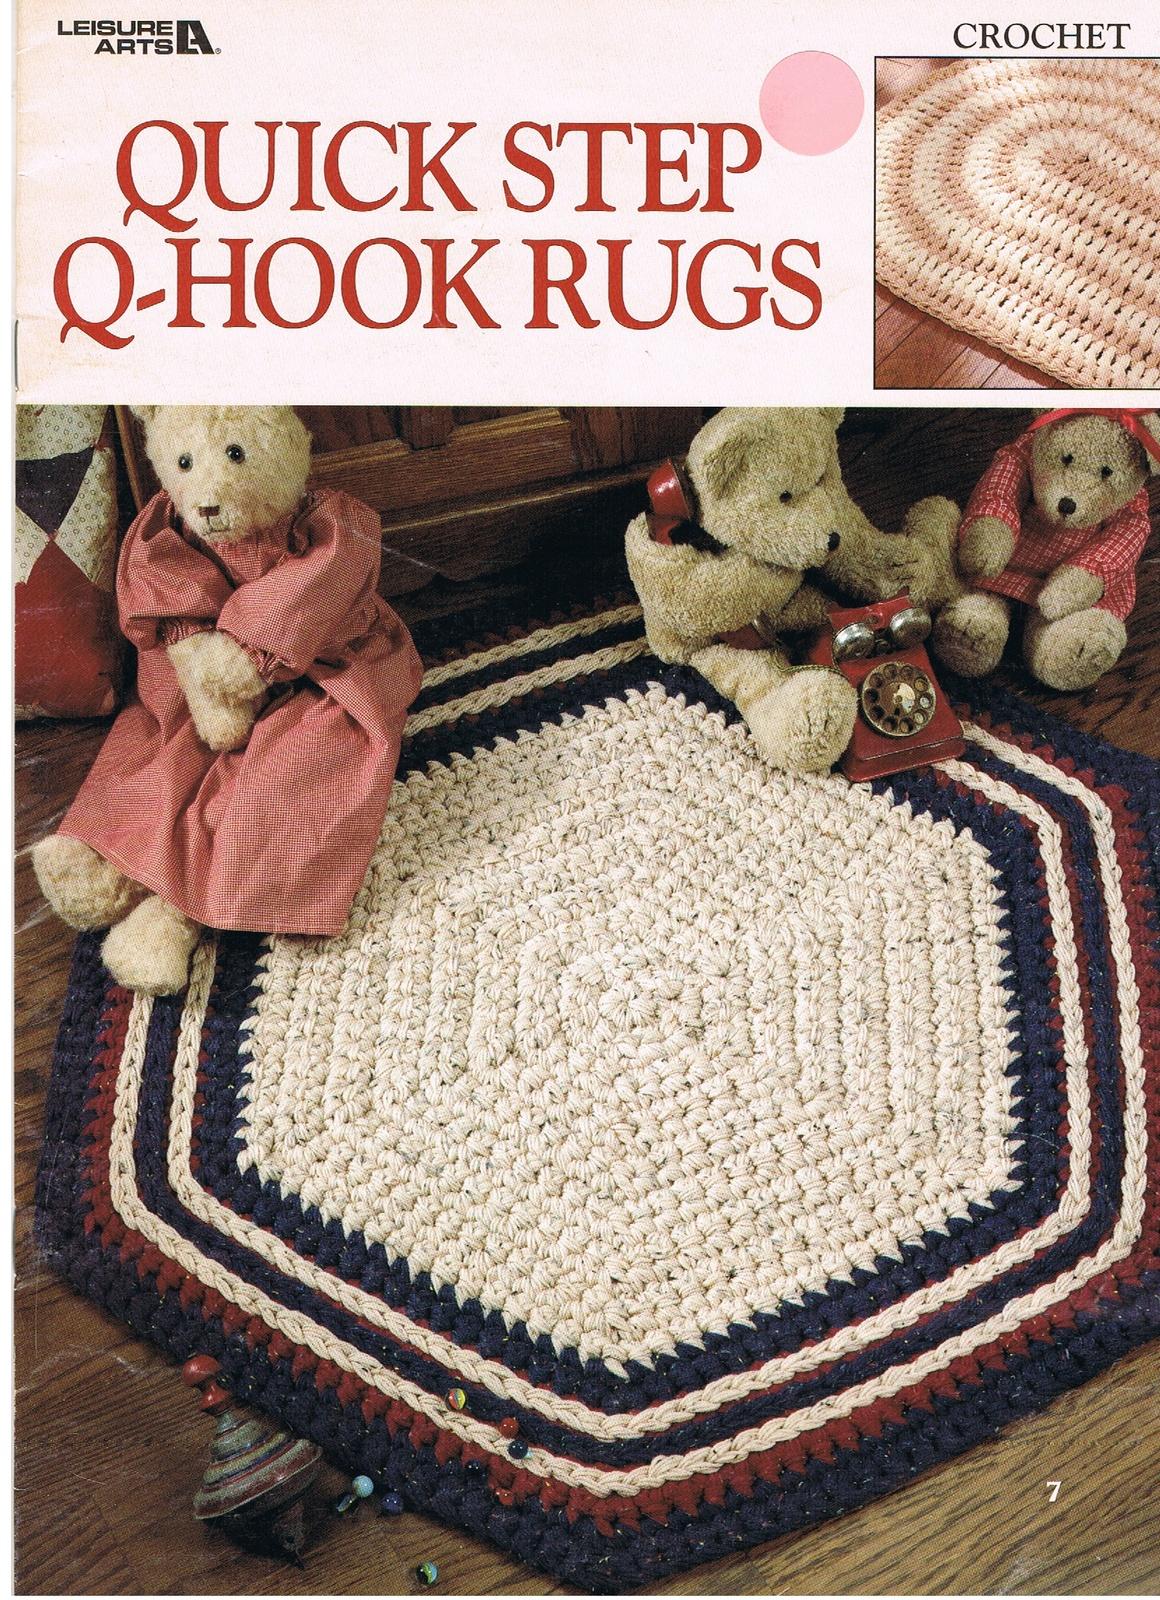 Quick step q hook rugs